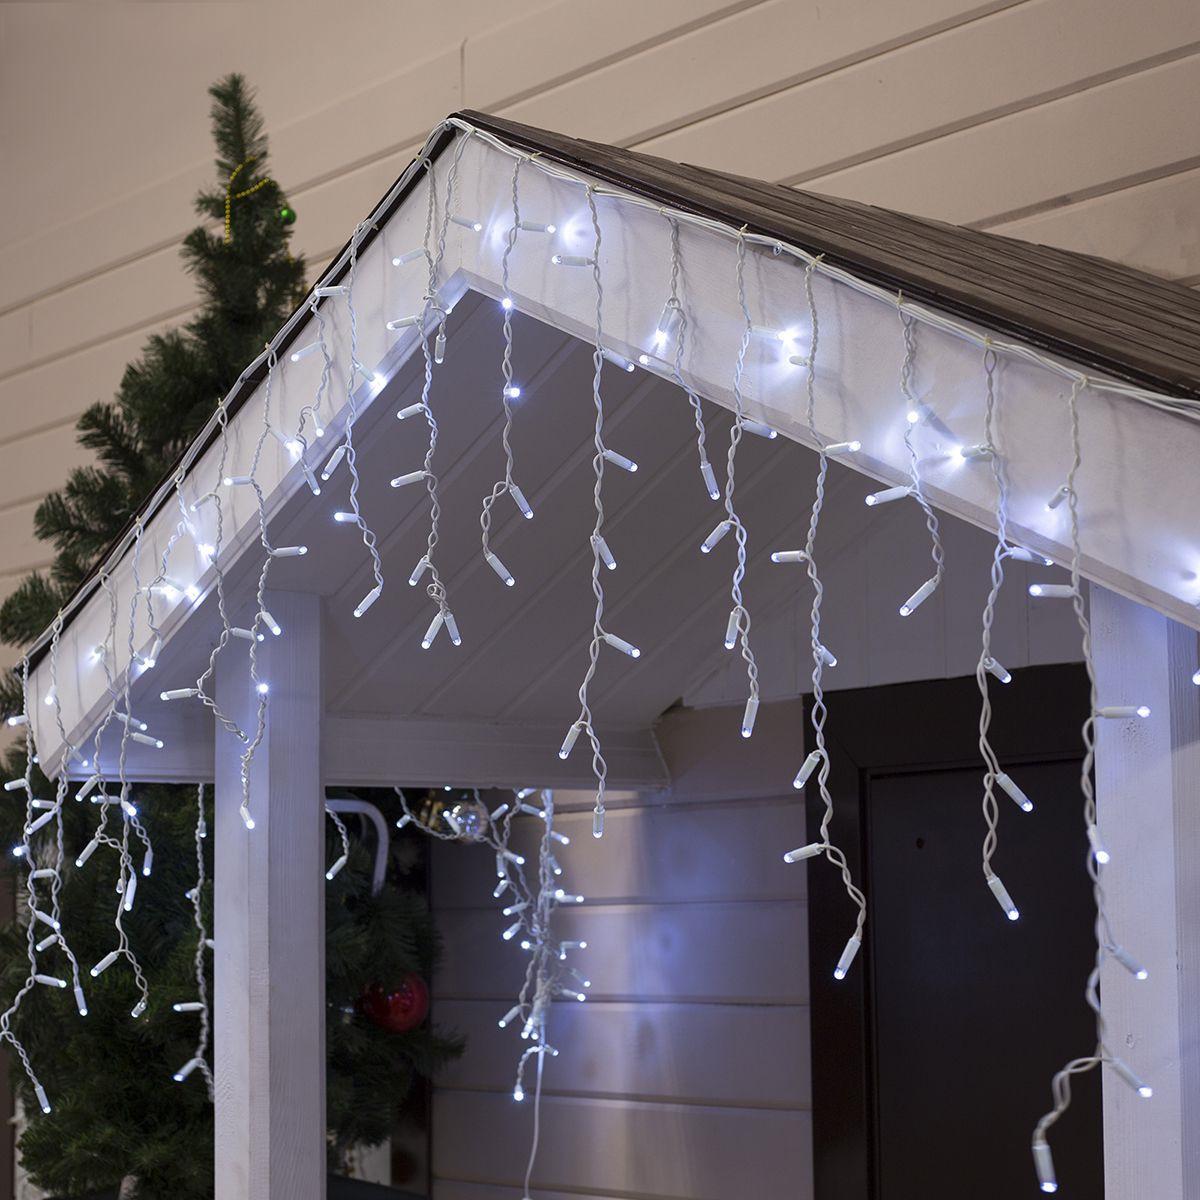 Электрогирлянда Бахрома Luazon Lighting Светодиодная 160 ламп, 3 м  #1